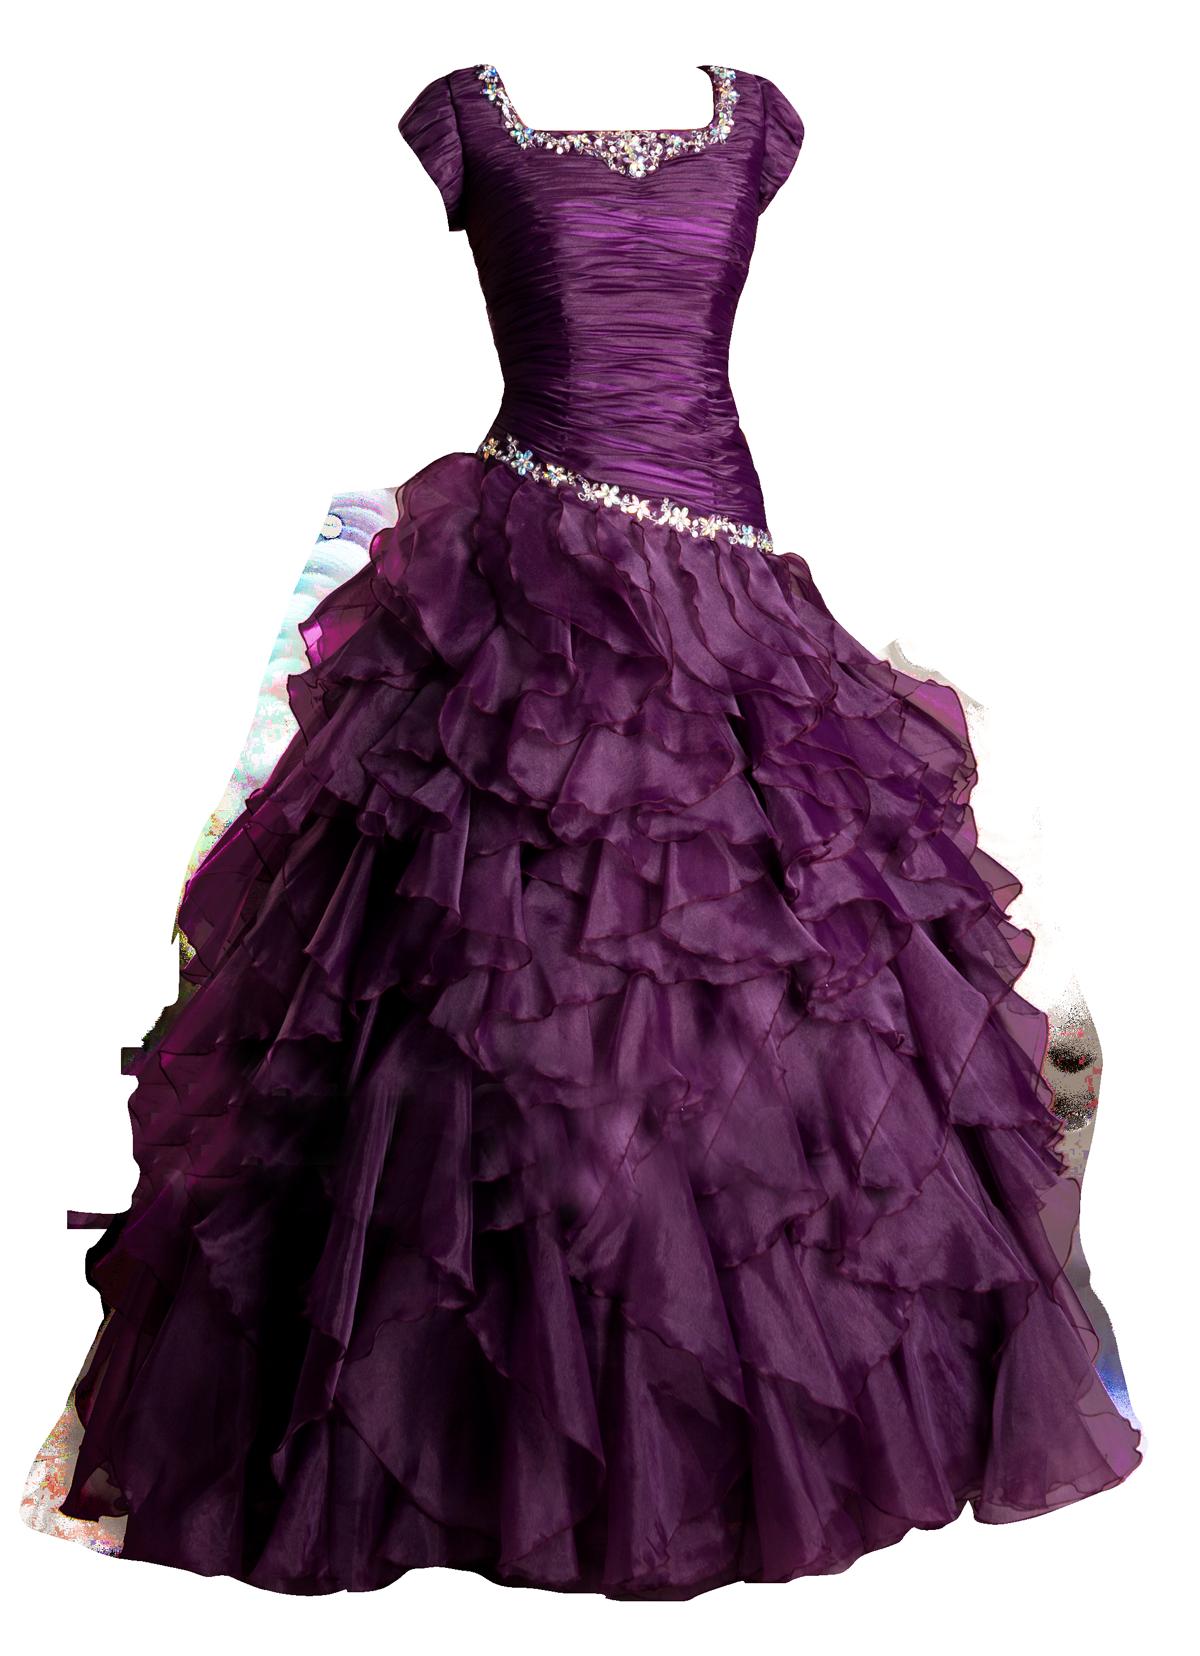 Dress clipart flower girl dress. Png transparent image best